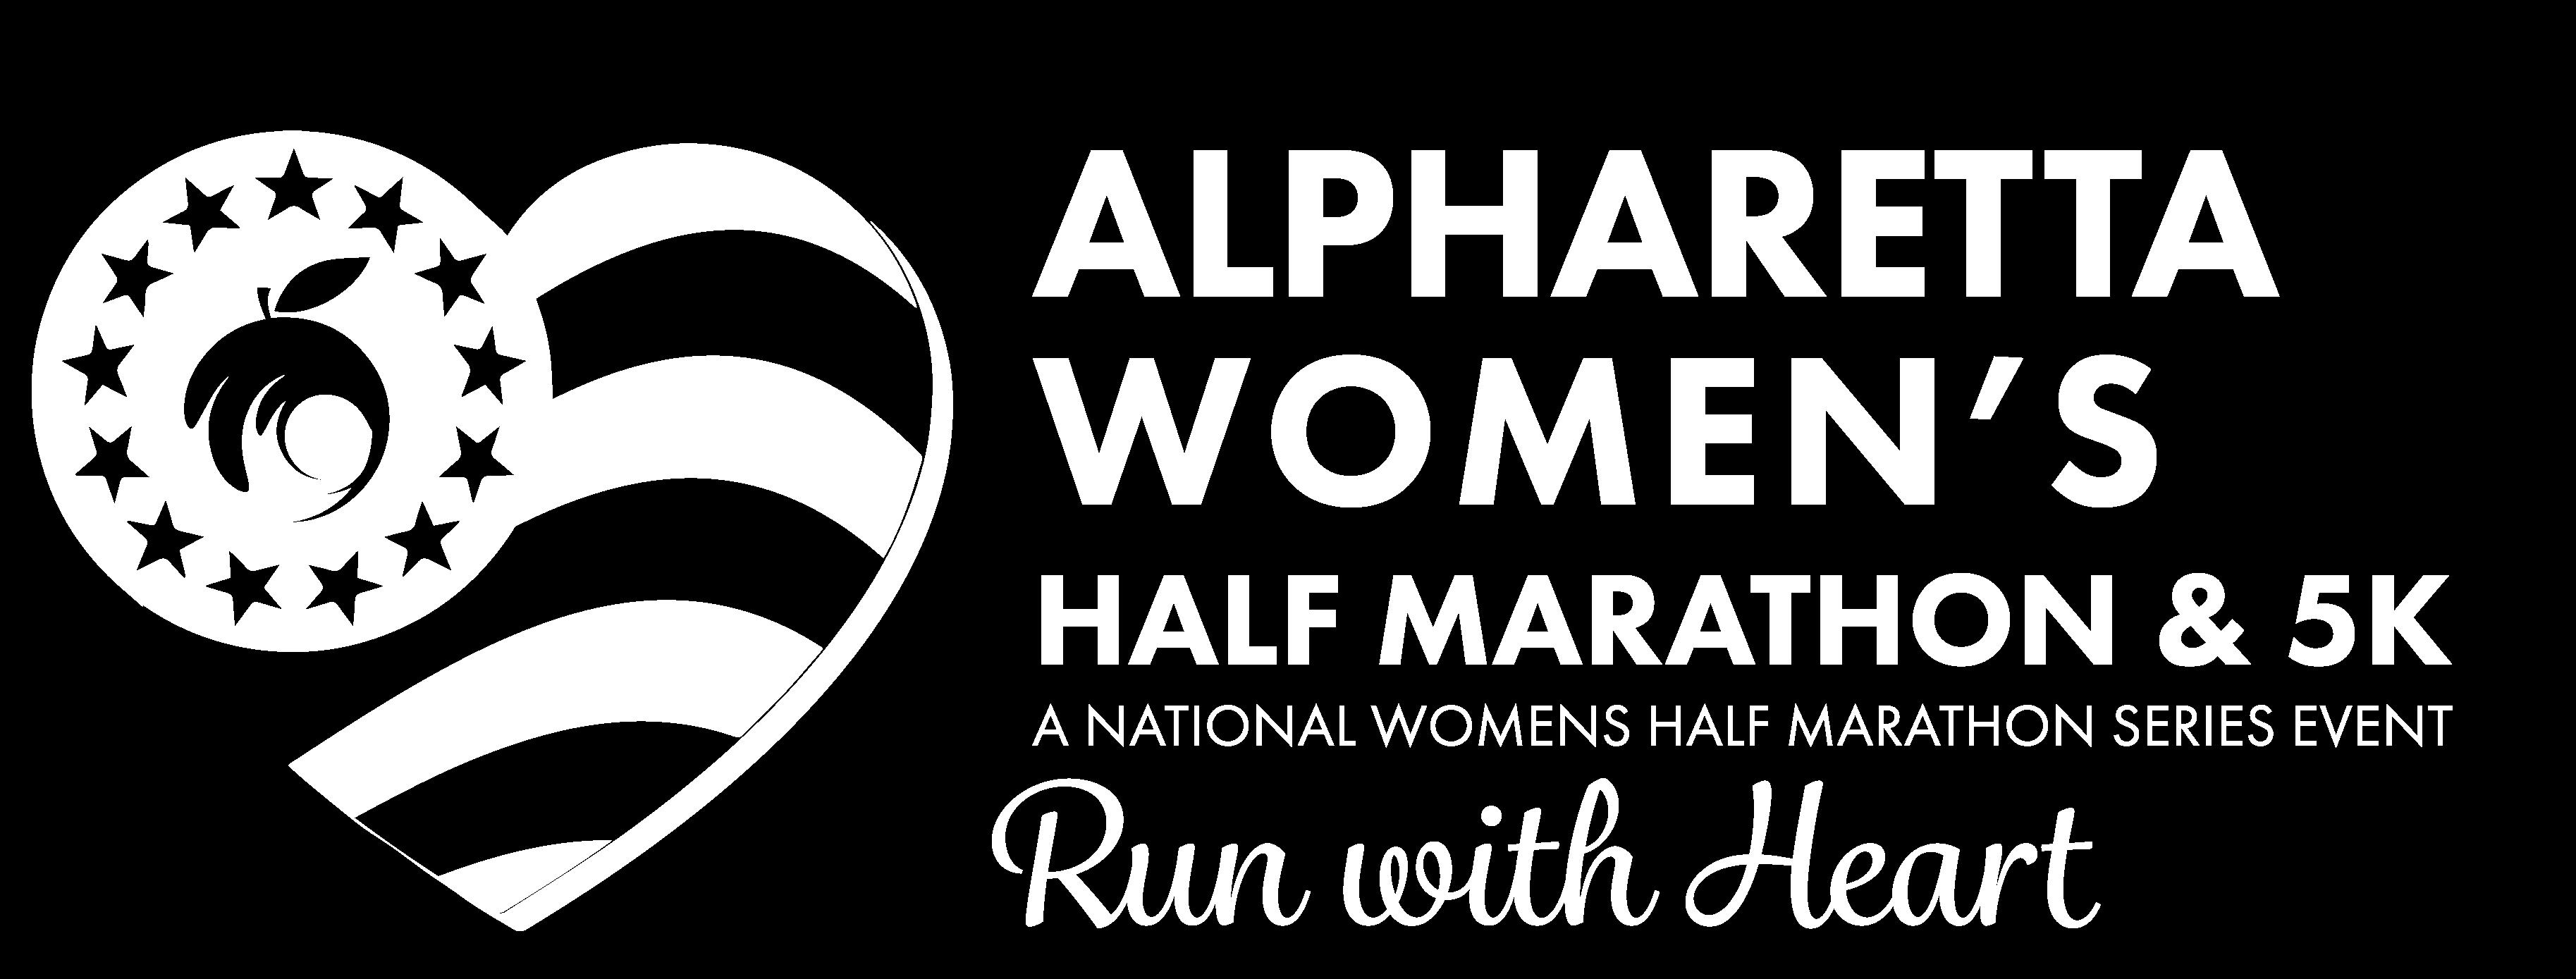 alpharetta women's half marathon & 5K